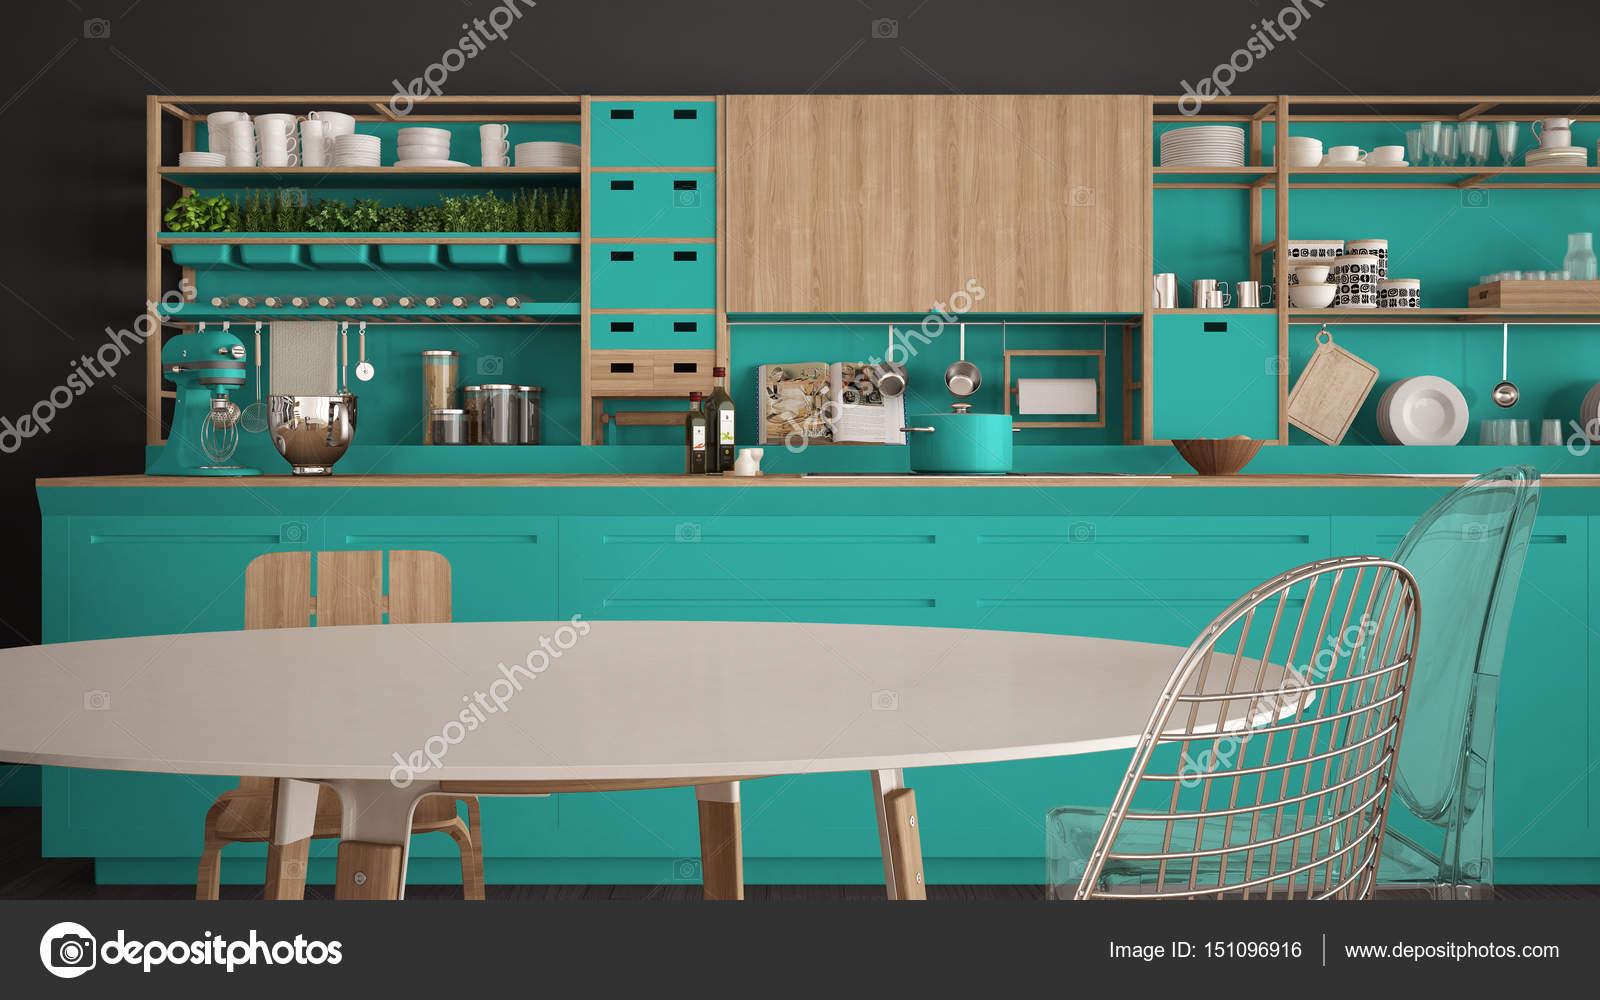 turquoise kitchen decor best hood 极简主义白色和绿松石木制厨房特写 scandina 图库照片 c archiviz